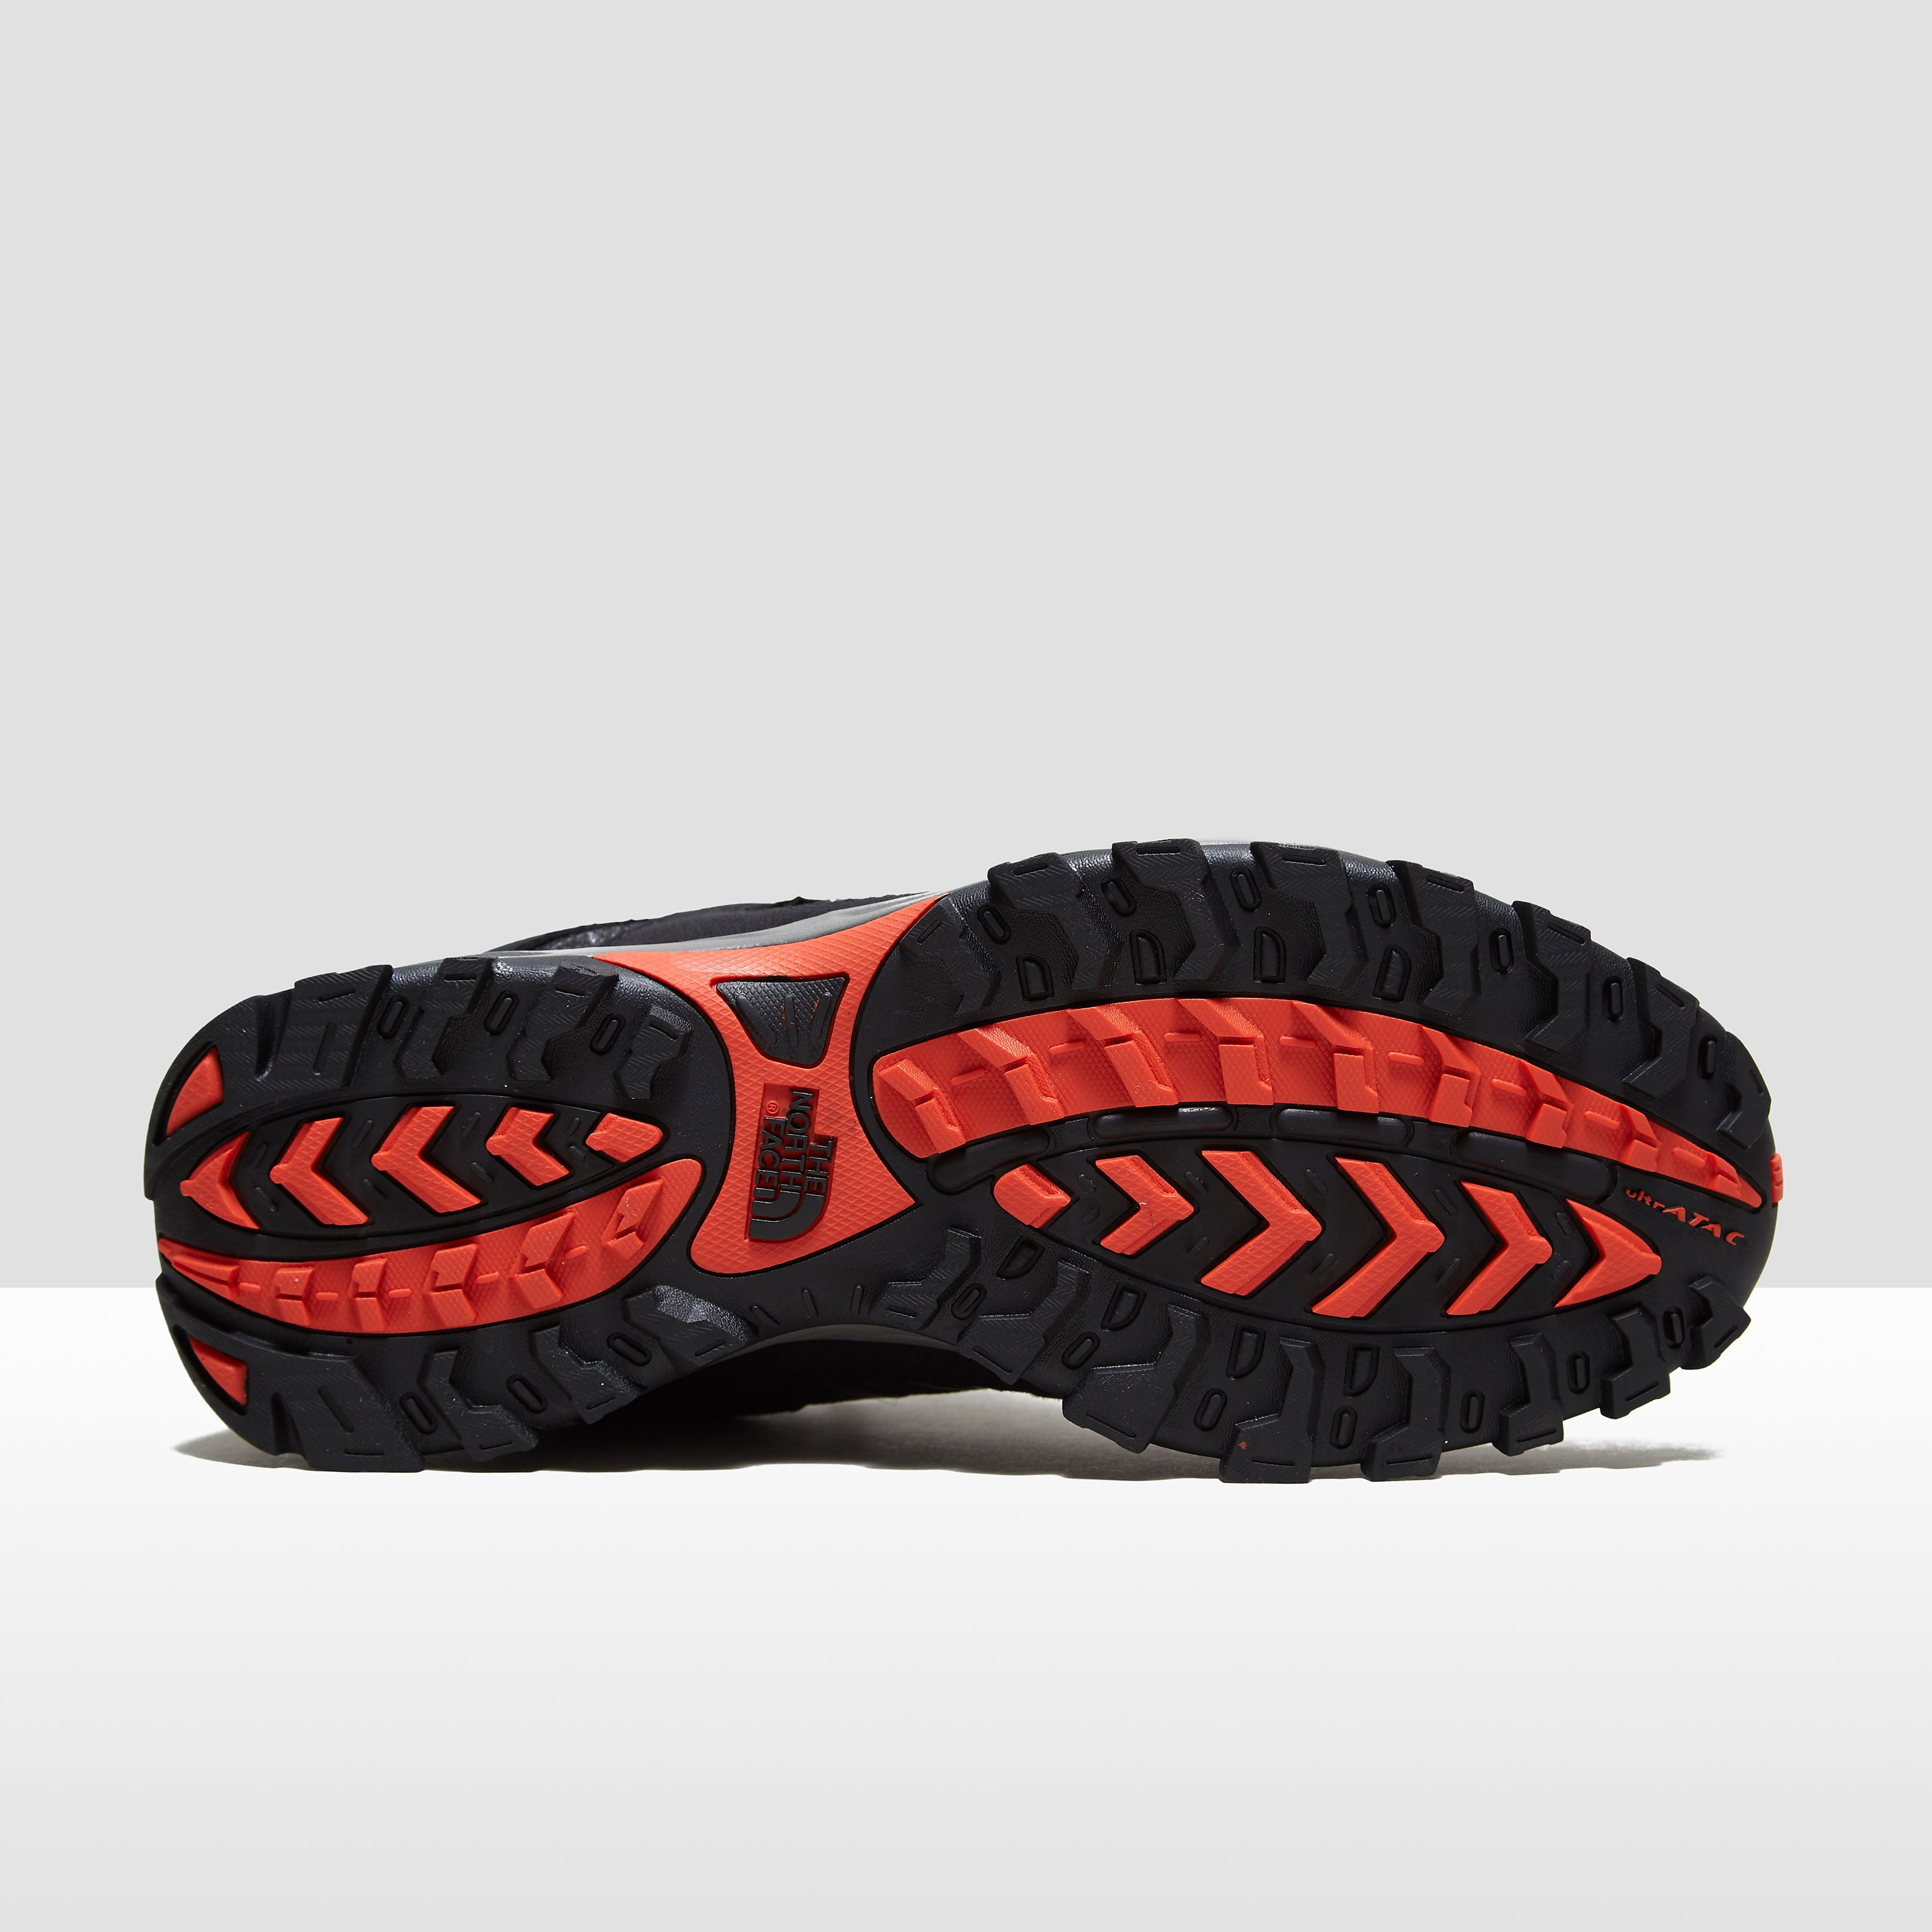 The North Face Terra GTX Men's Walking Shoes